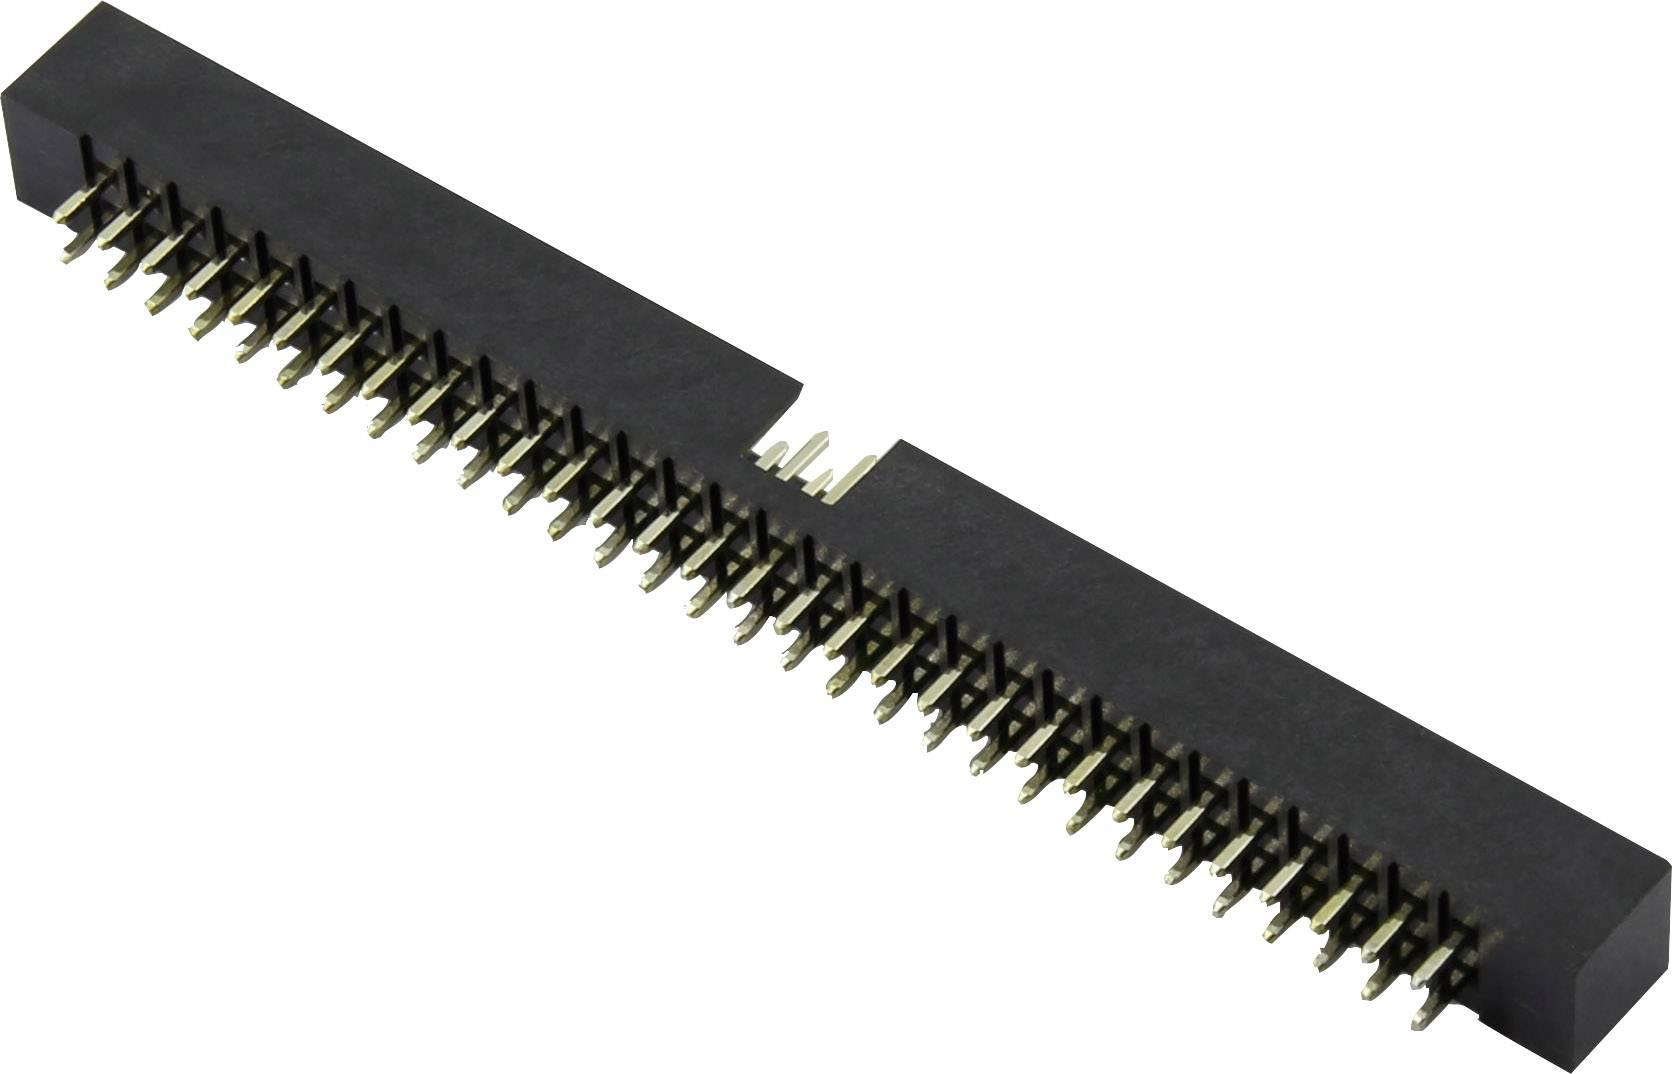 Konektor pro ploché kabely Connfly DS1014-16SF1B, rastr (rozteč): 2 mm, počet pólů: 16, 1 ks